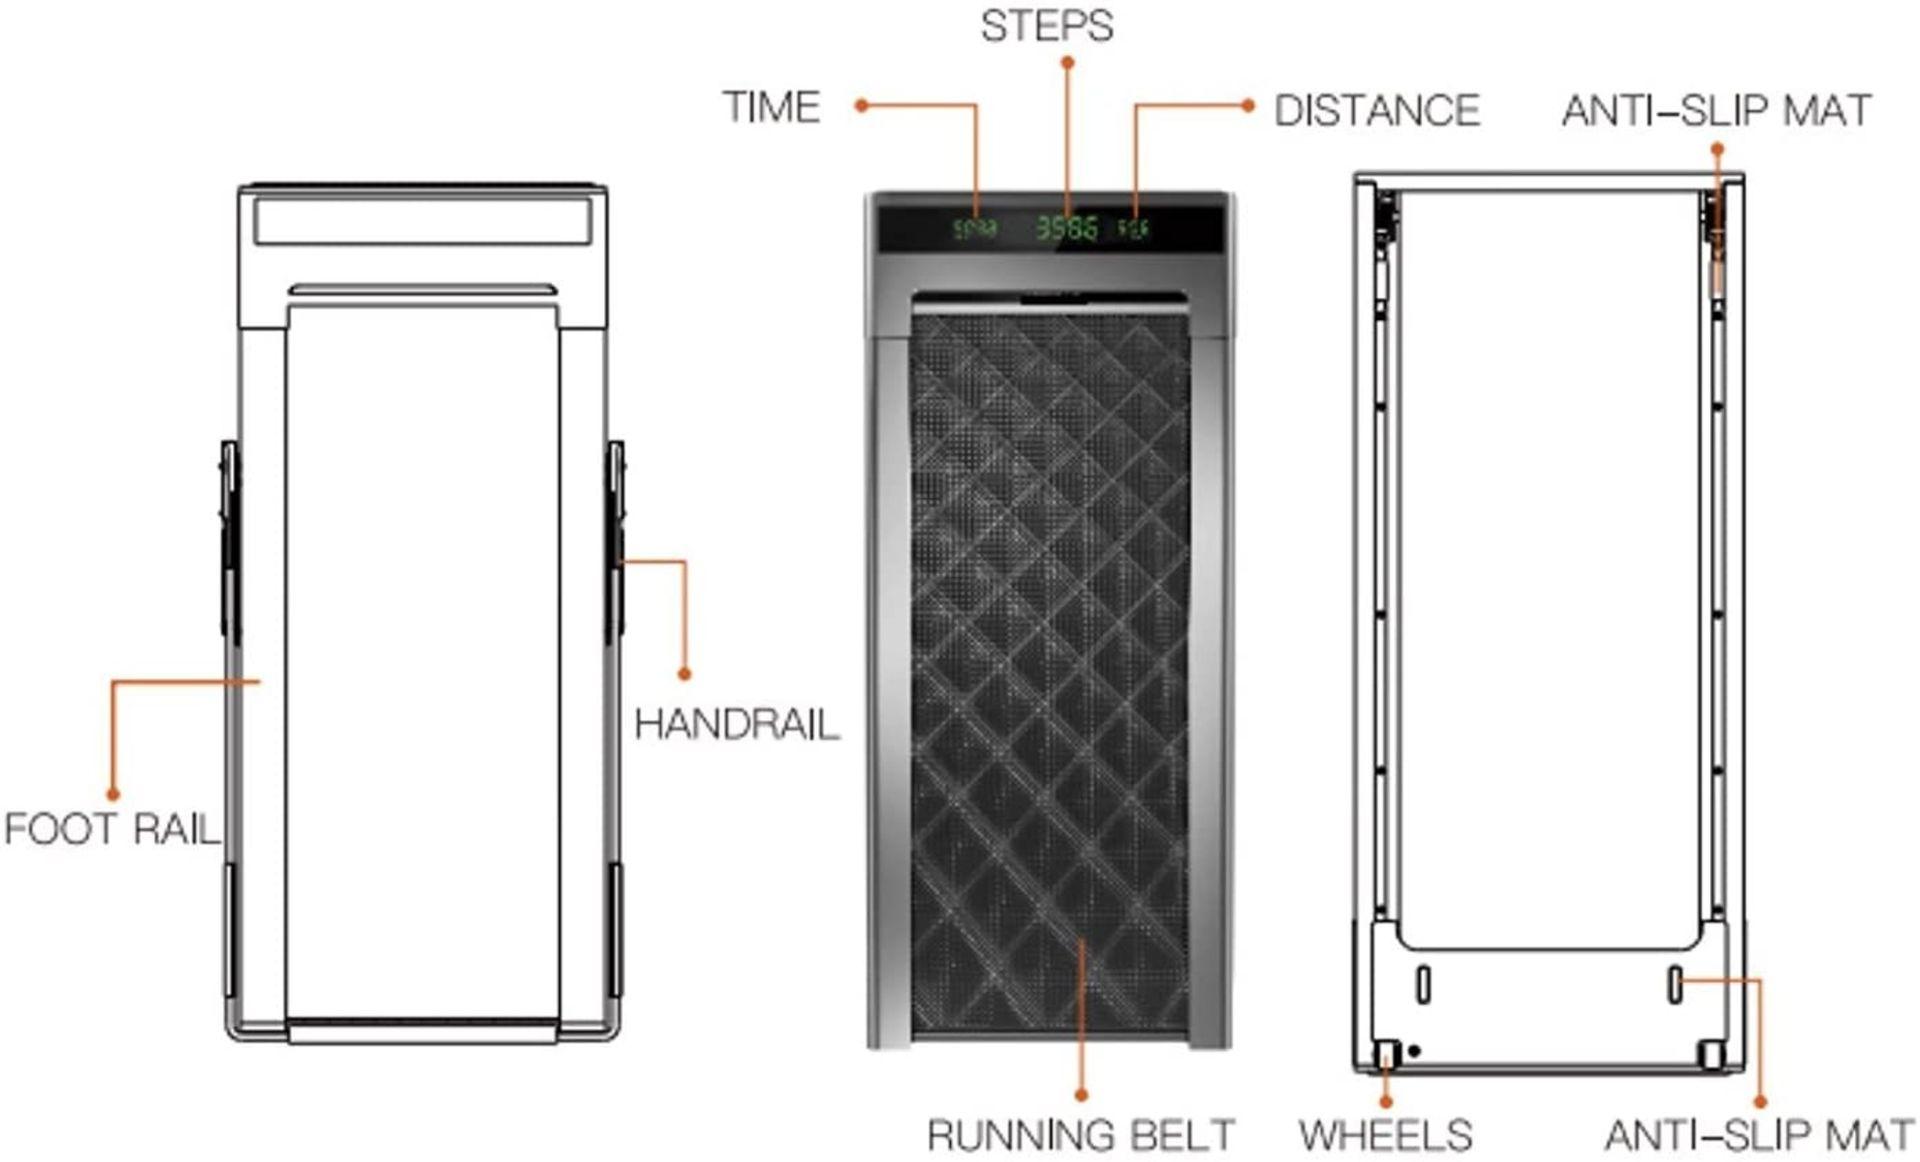 1 x Slim Tread Ultra Thin Smart Treadmill Running / Walking Machine - Lightweight With Folding - Image 9 of 19